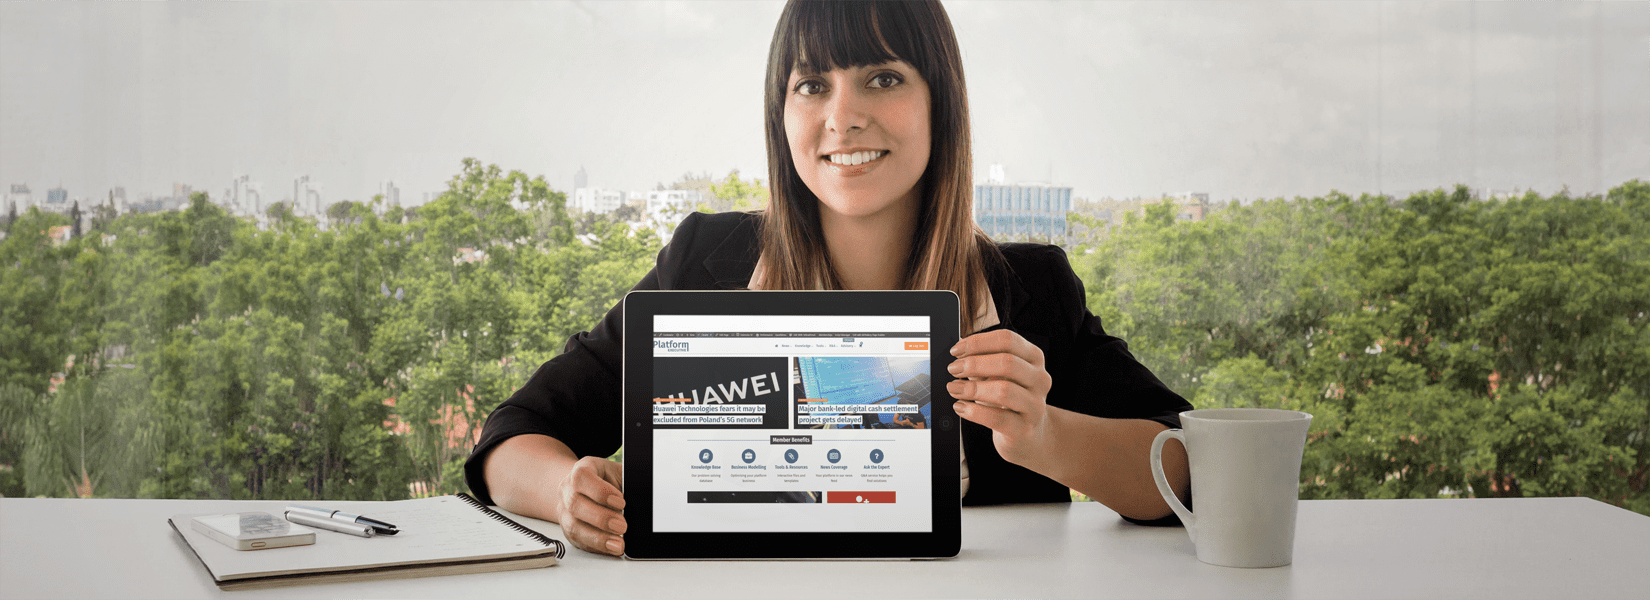 Platform review services from Platform Executive